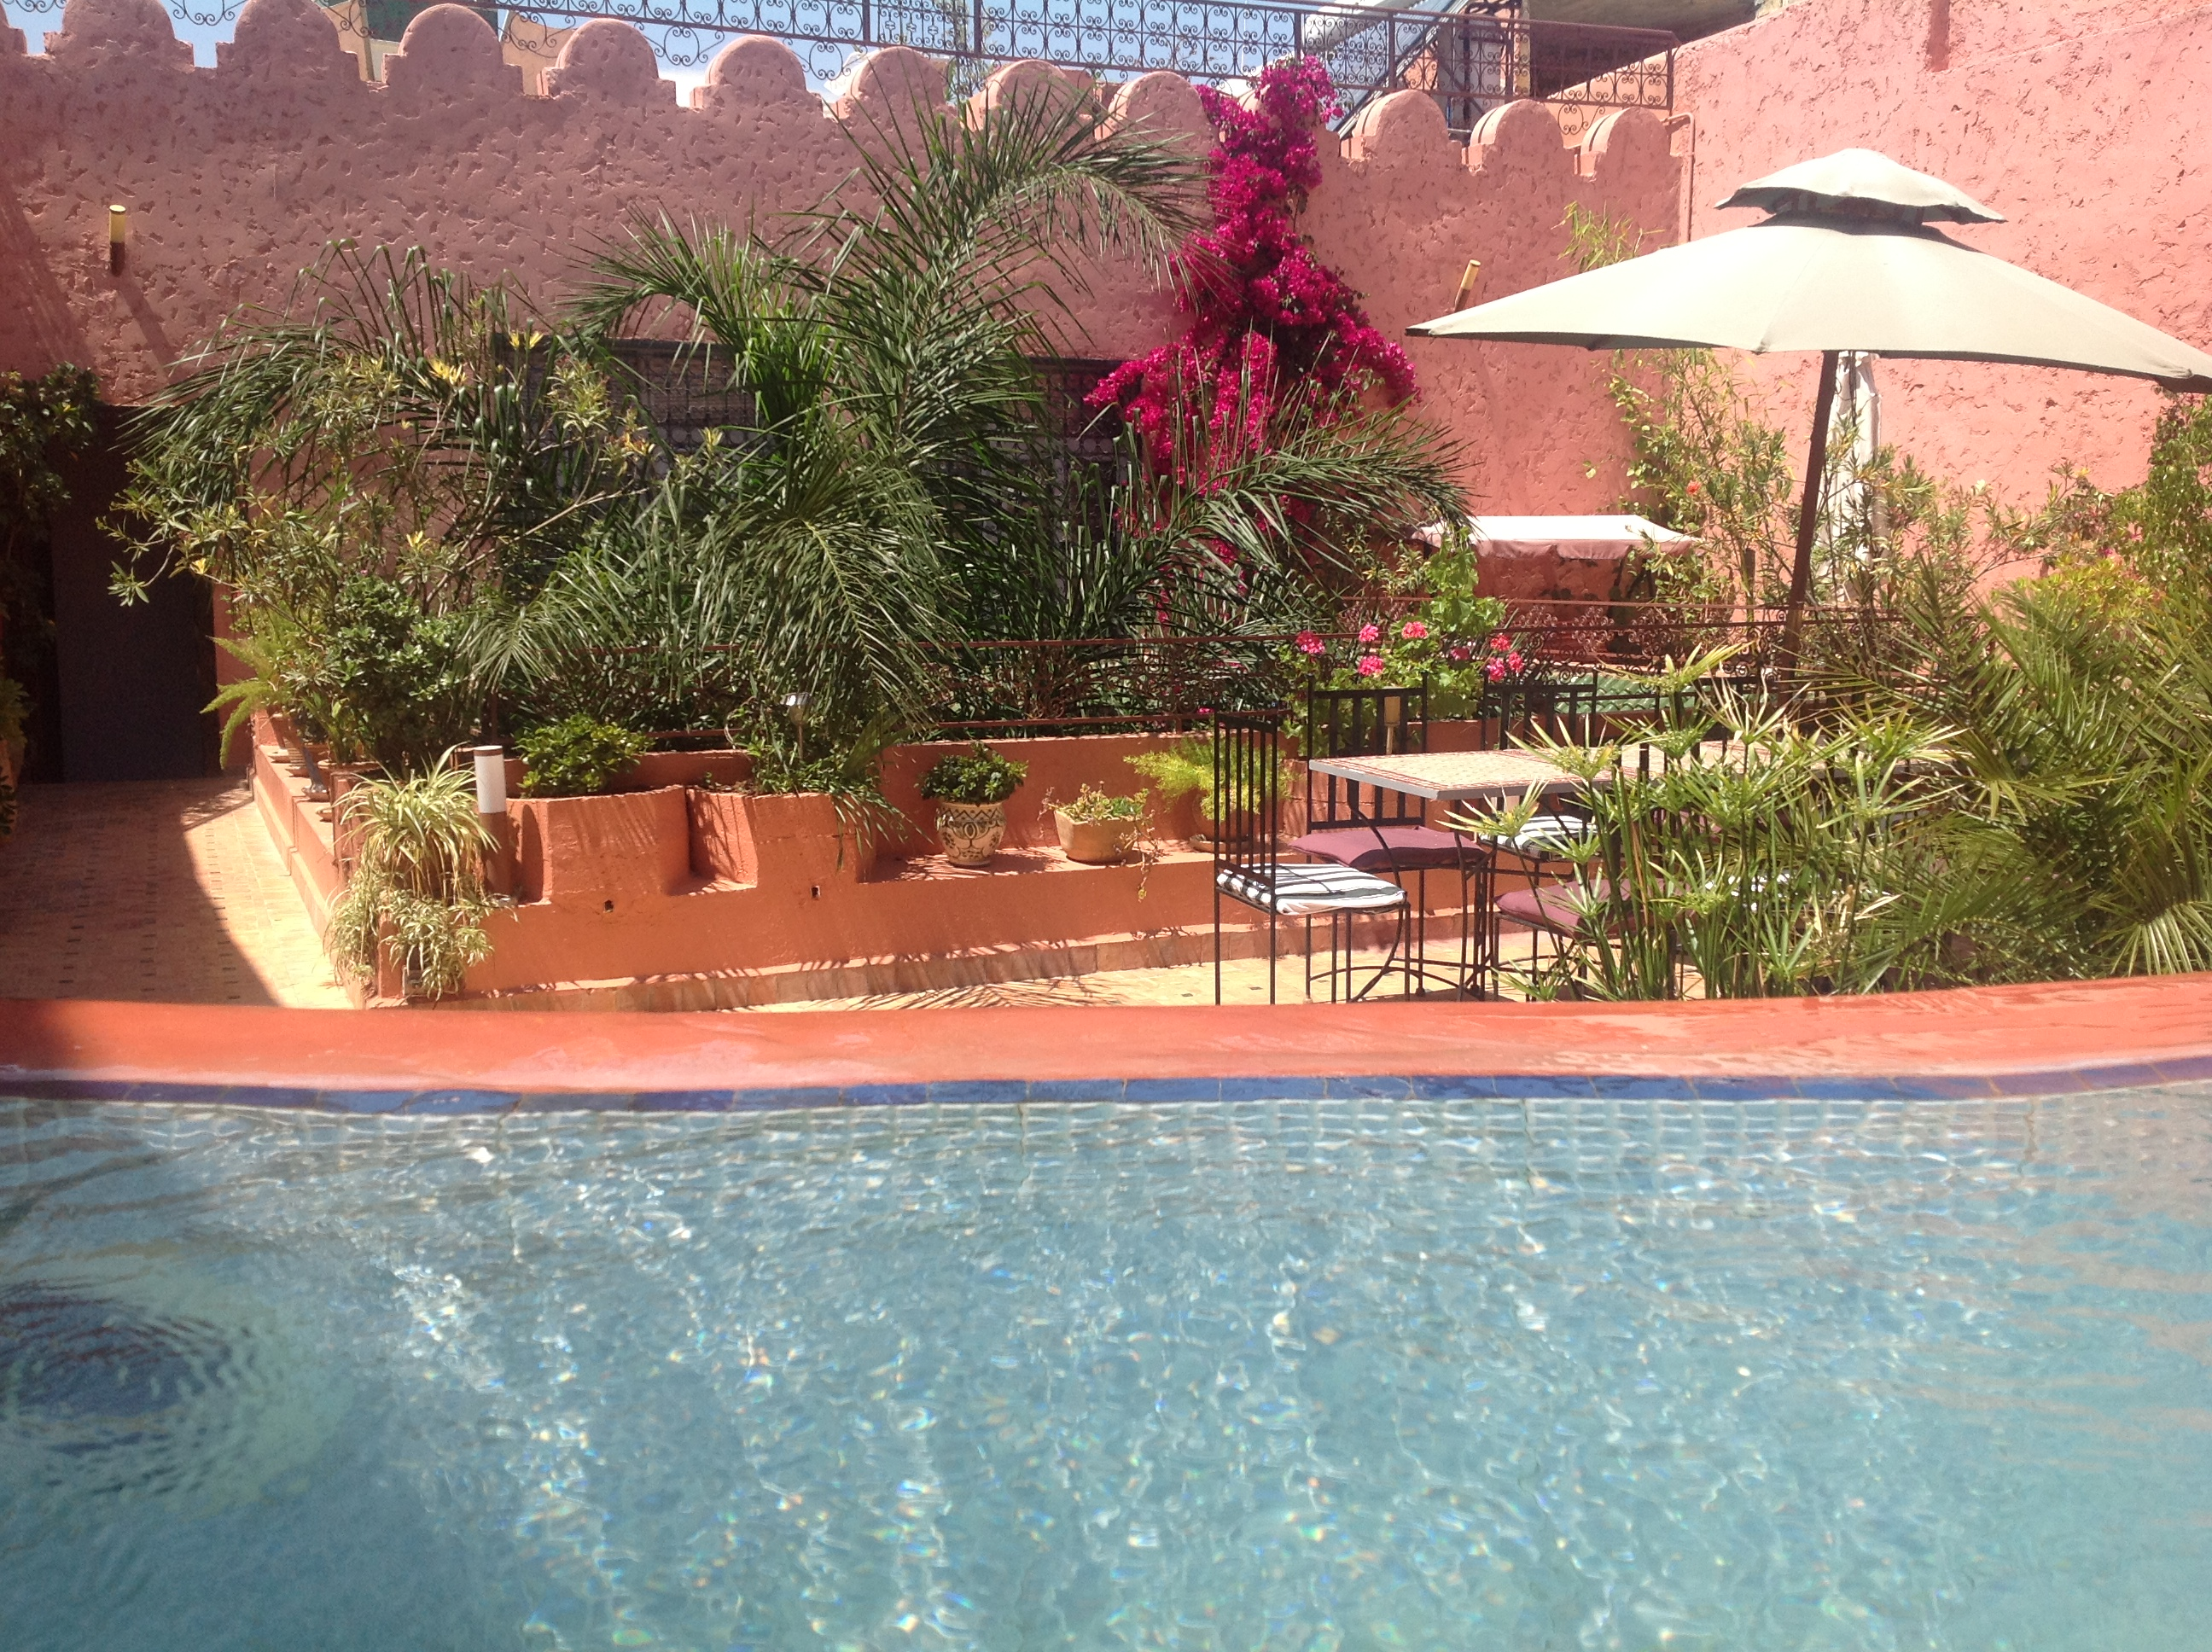 Riad meknes chambres d 39 h tes maroc riad el ma visite for Piscine demontable maroc